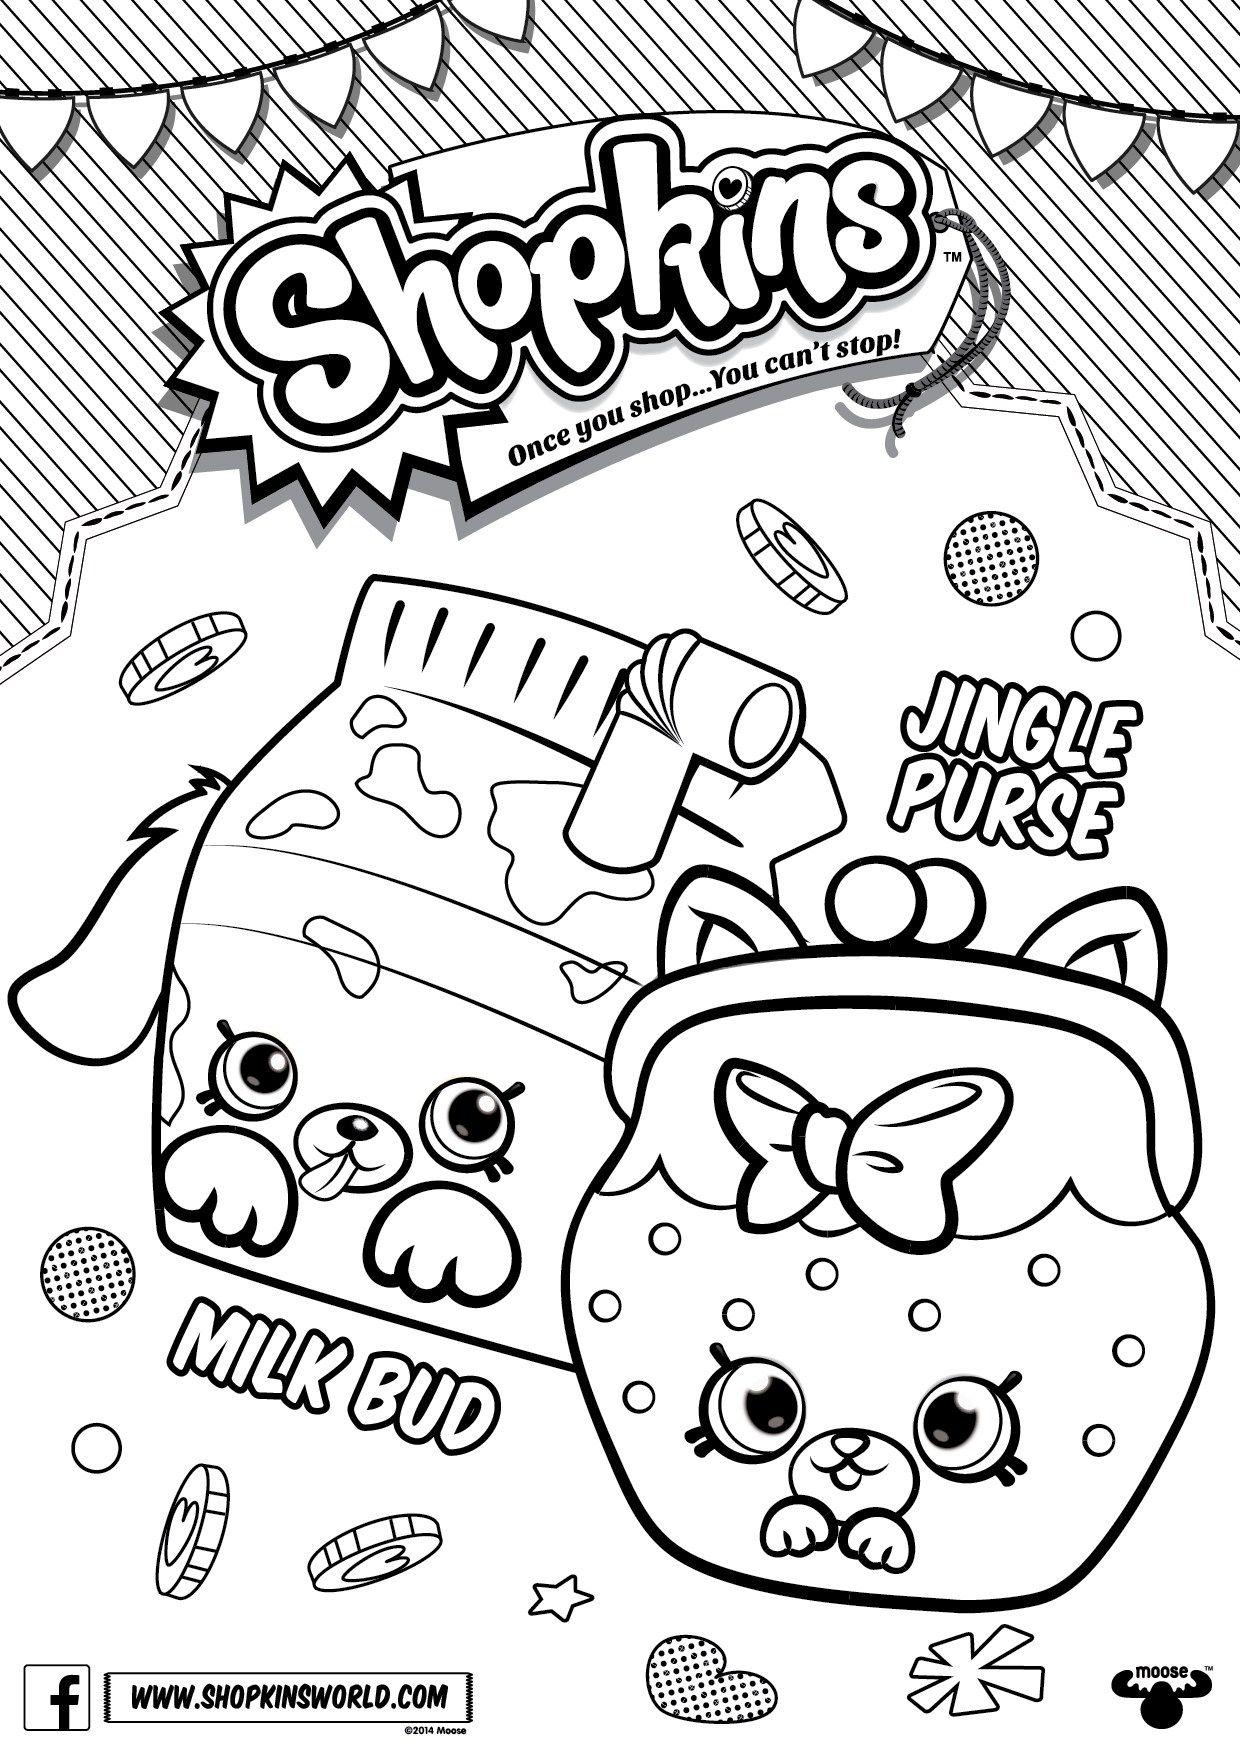 Shopkins Coloring Pages Season 4 Pe Ins Jingle Purse Milk Bud